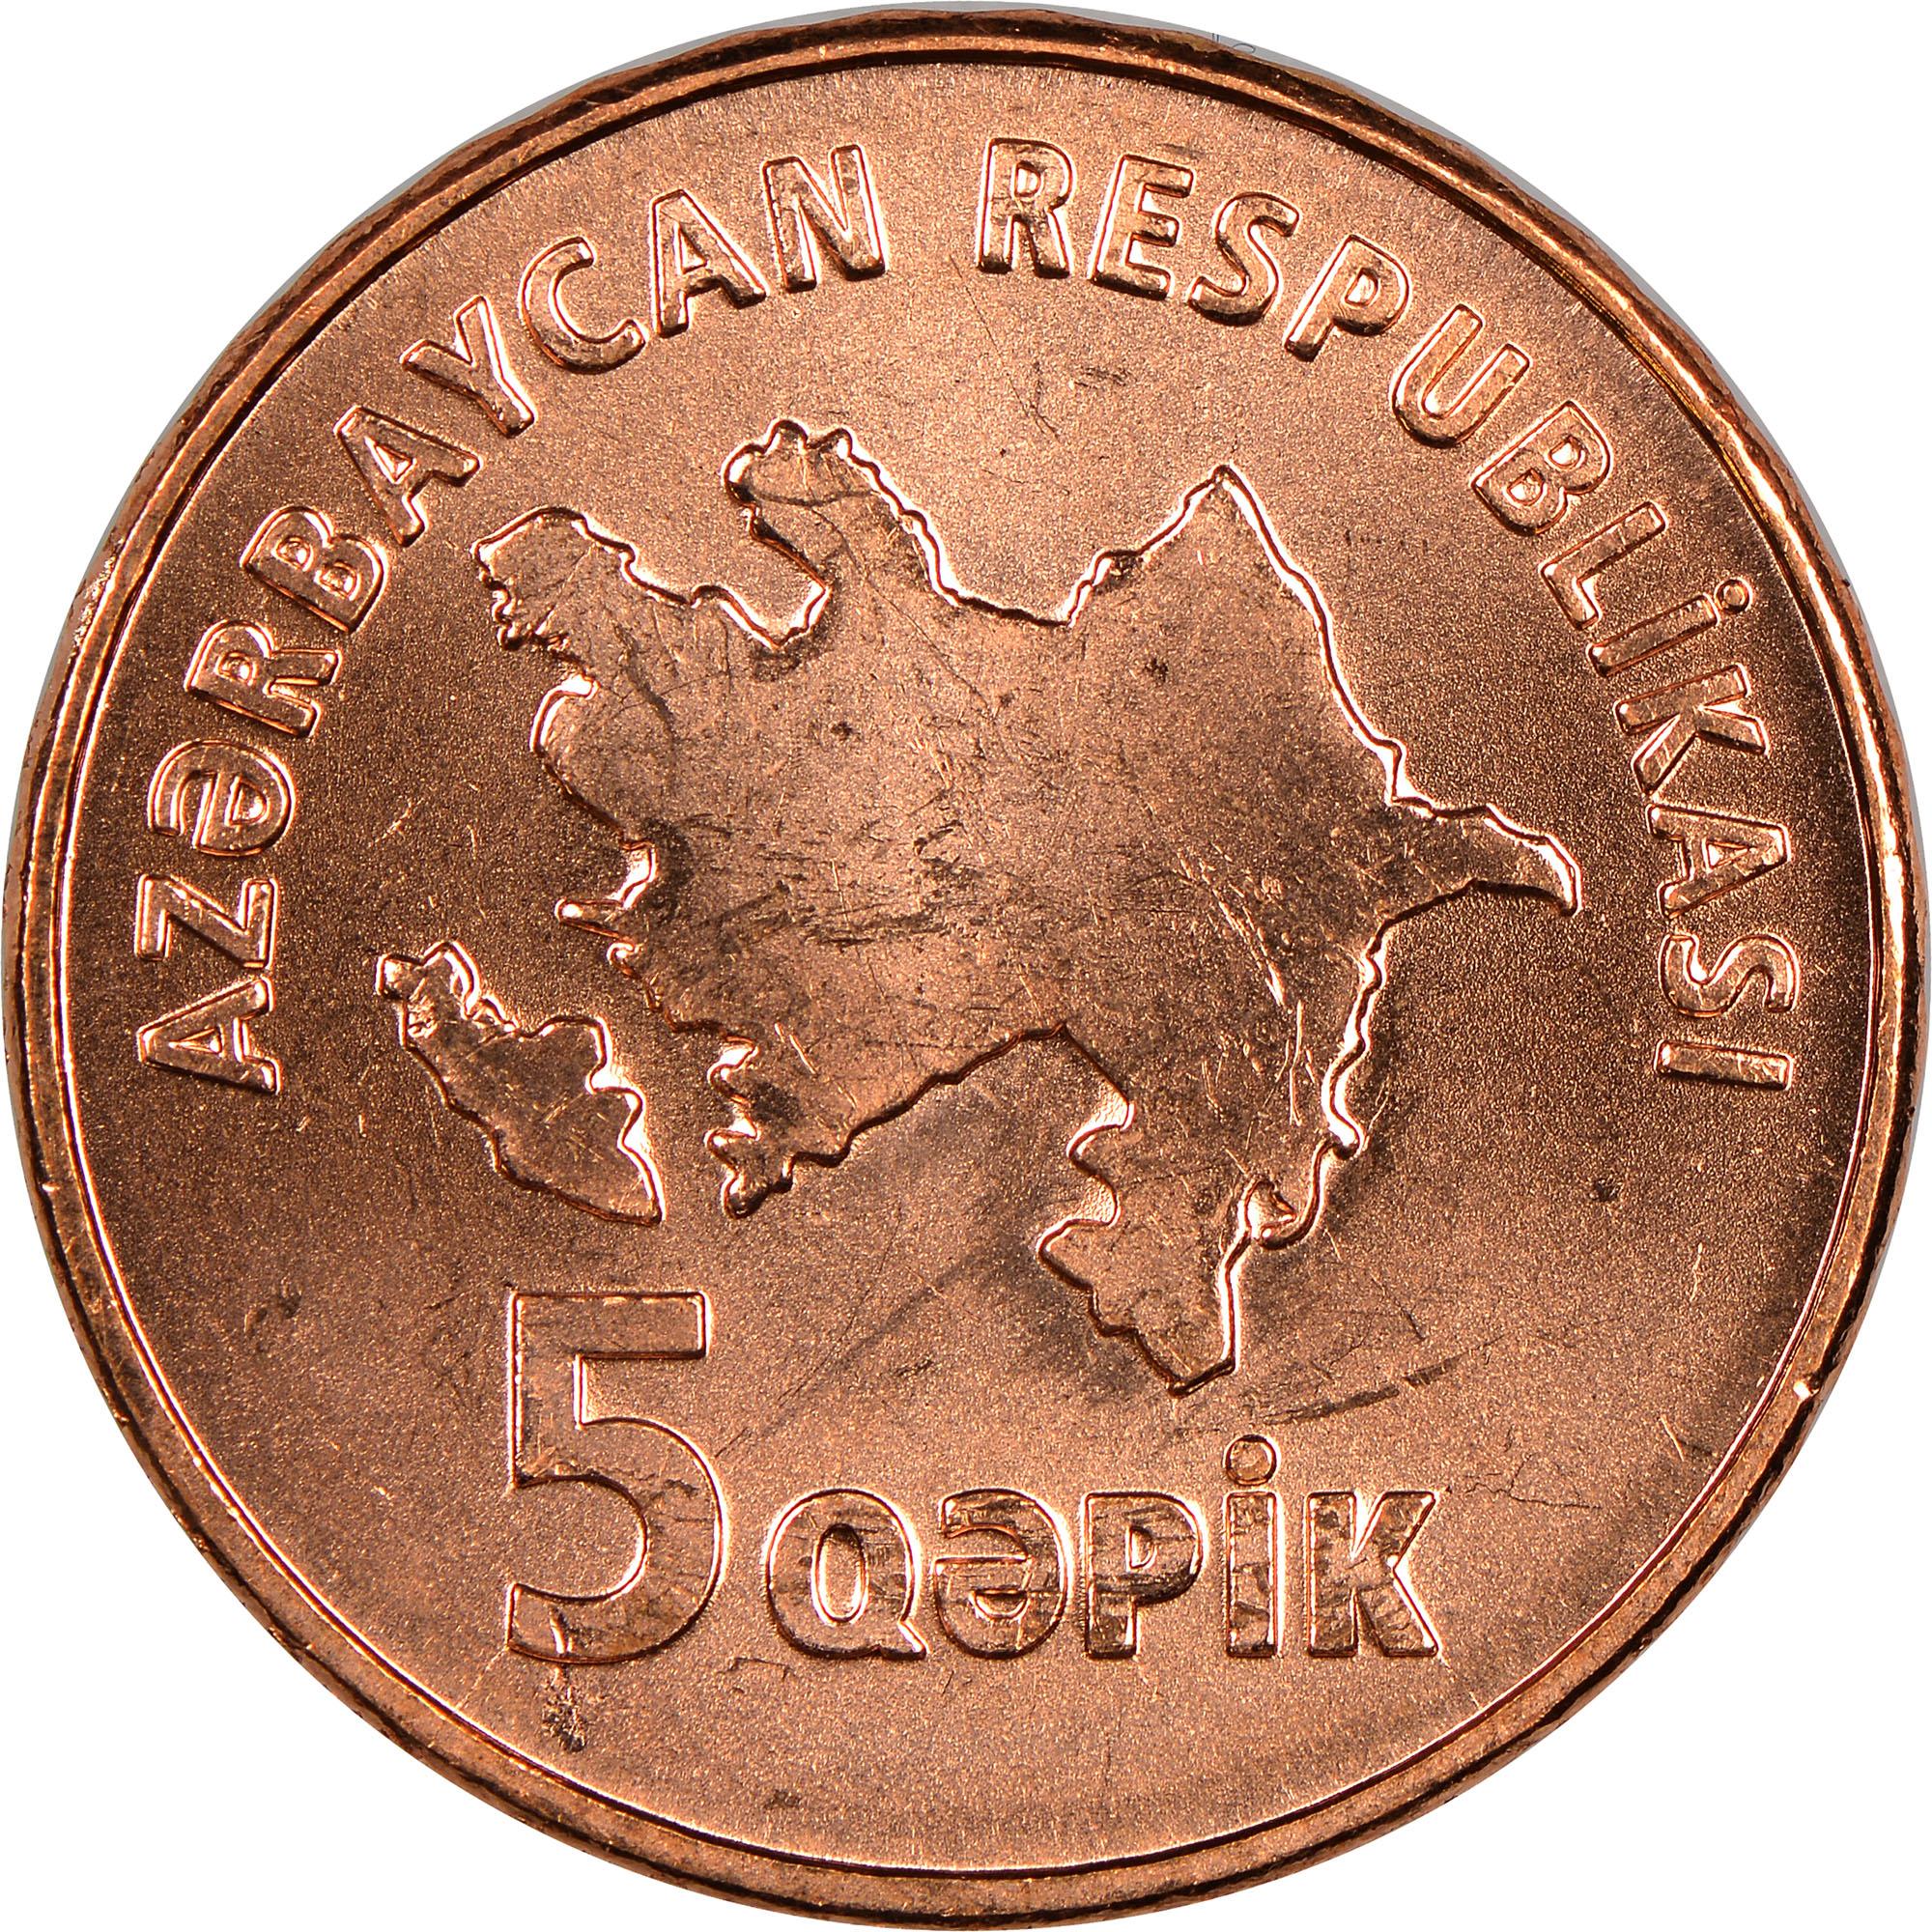 Azerbaijan 5 Qapik obverse